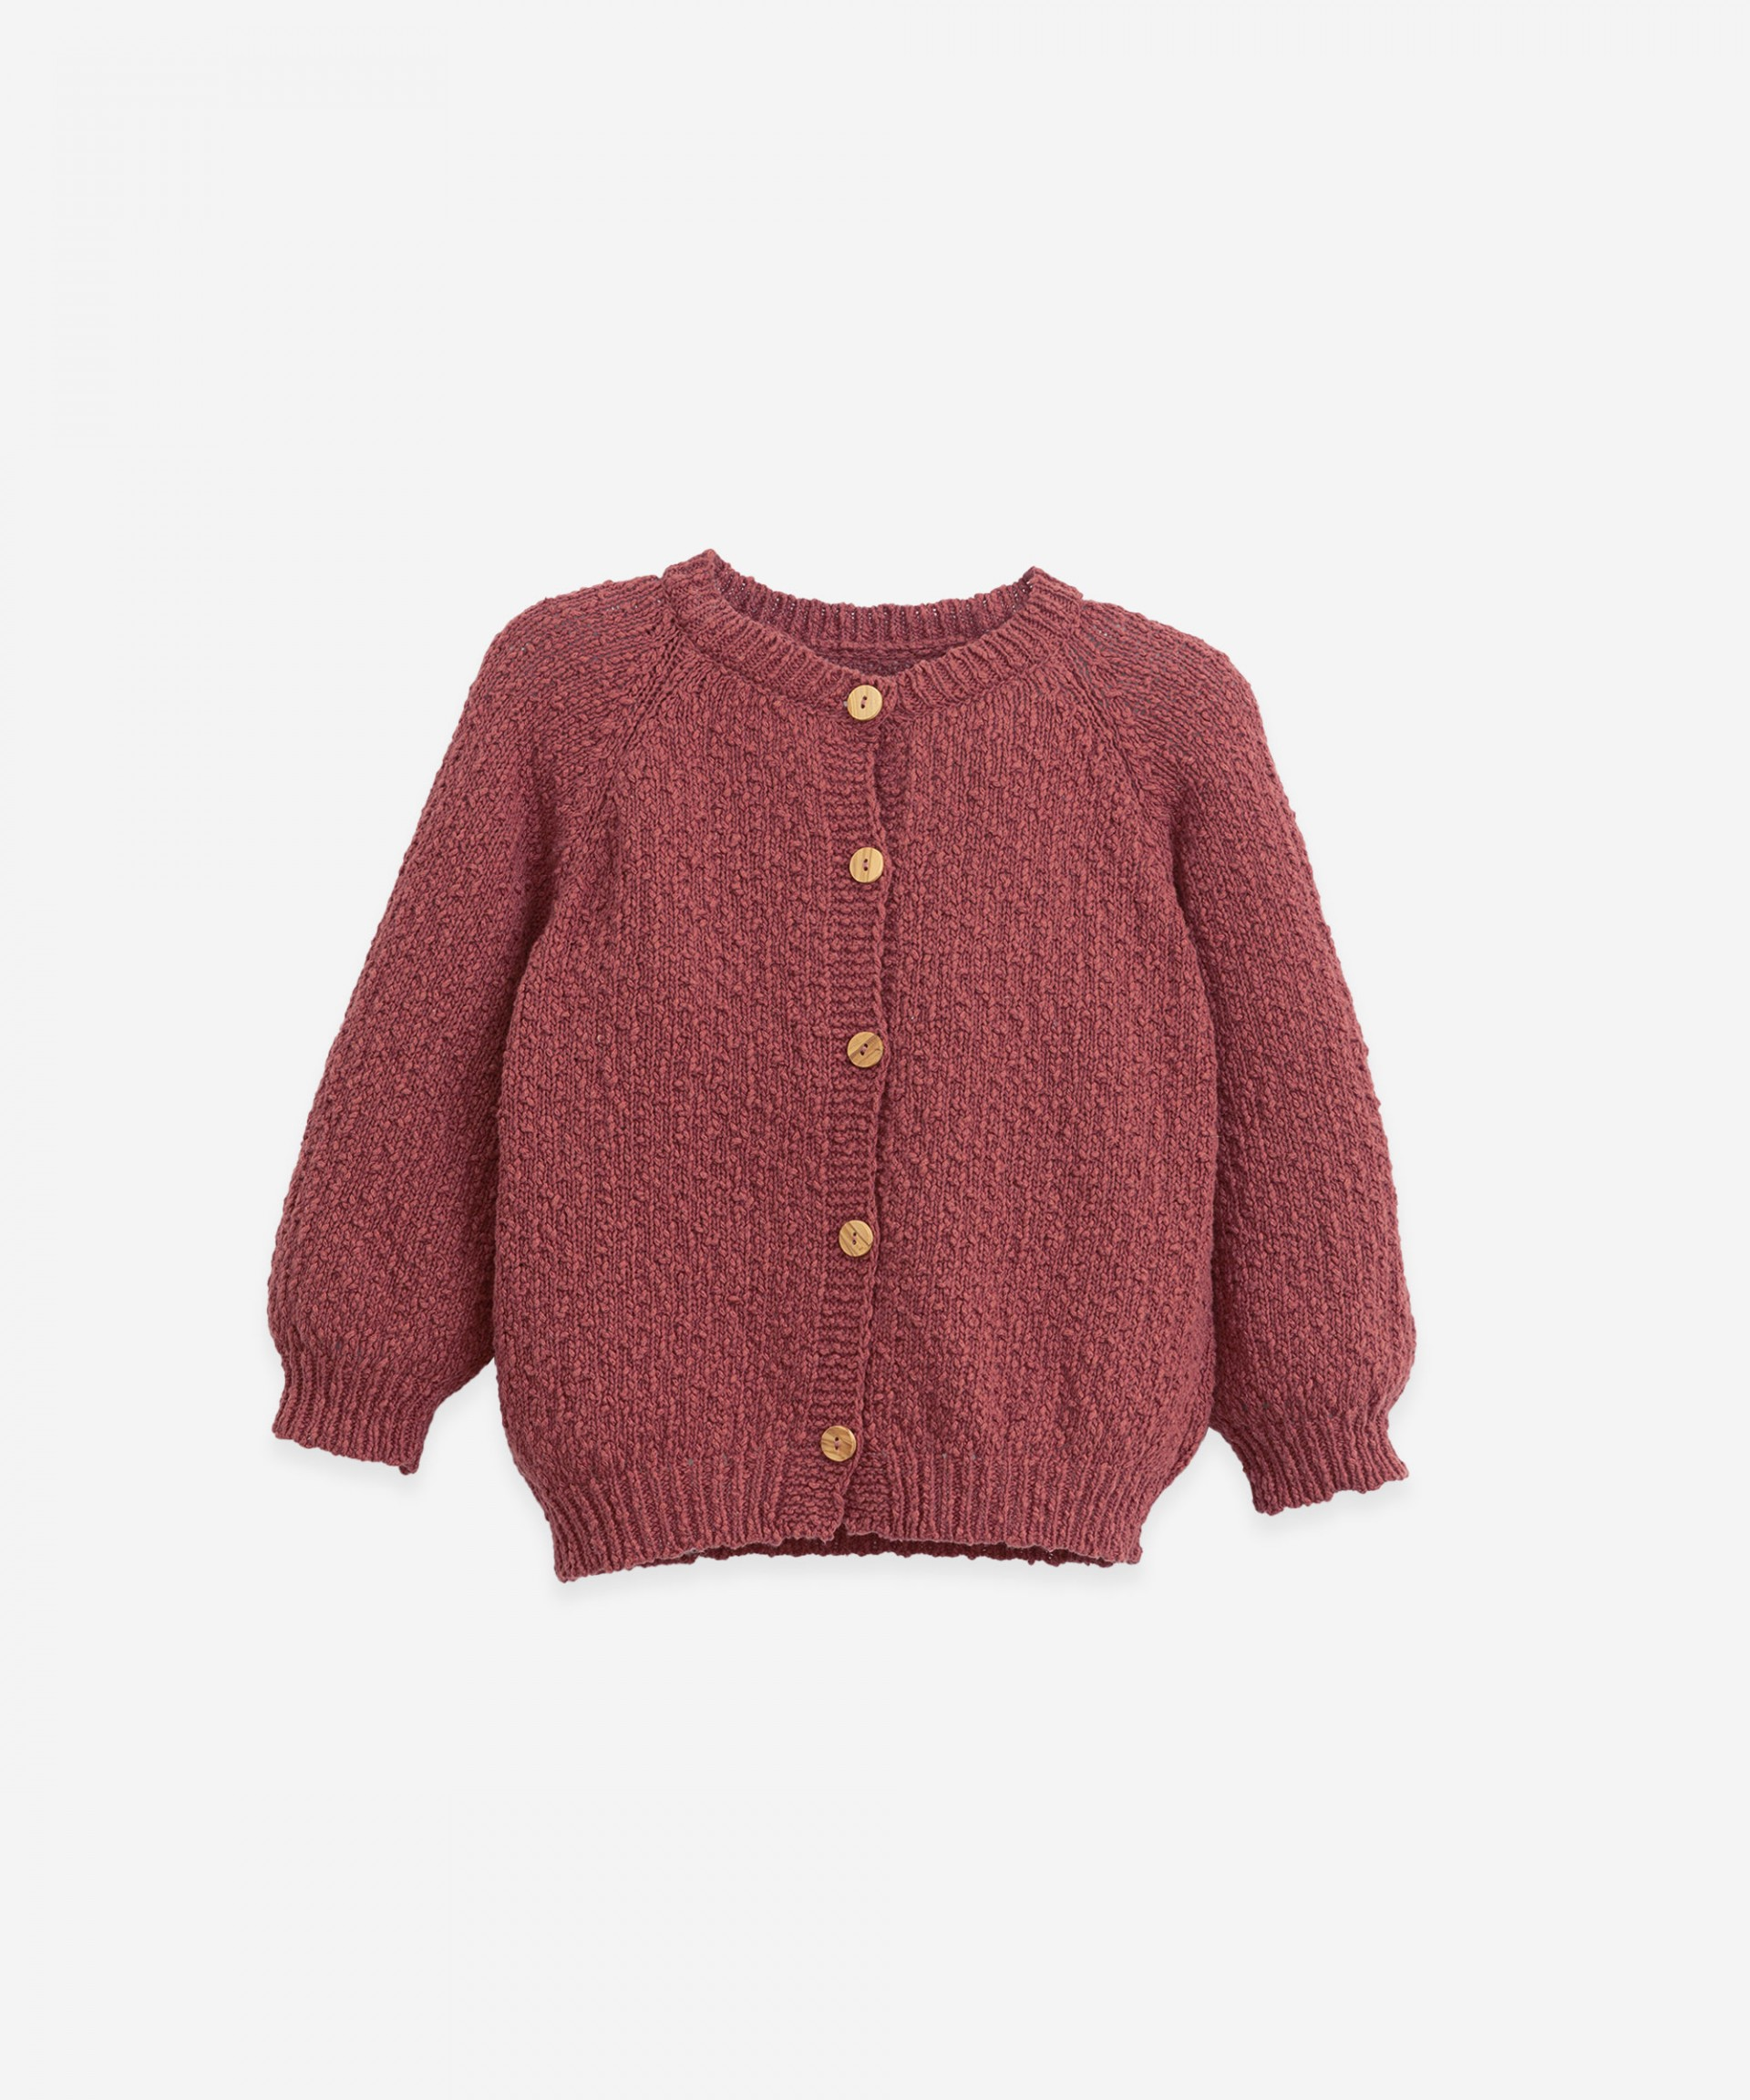 Knitted cardigan | Botany